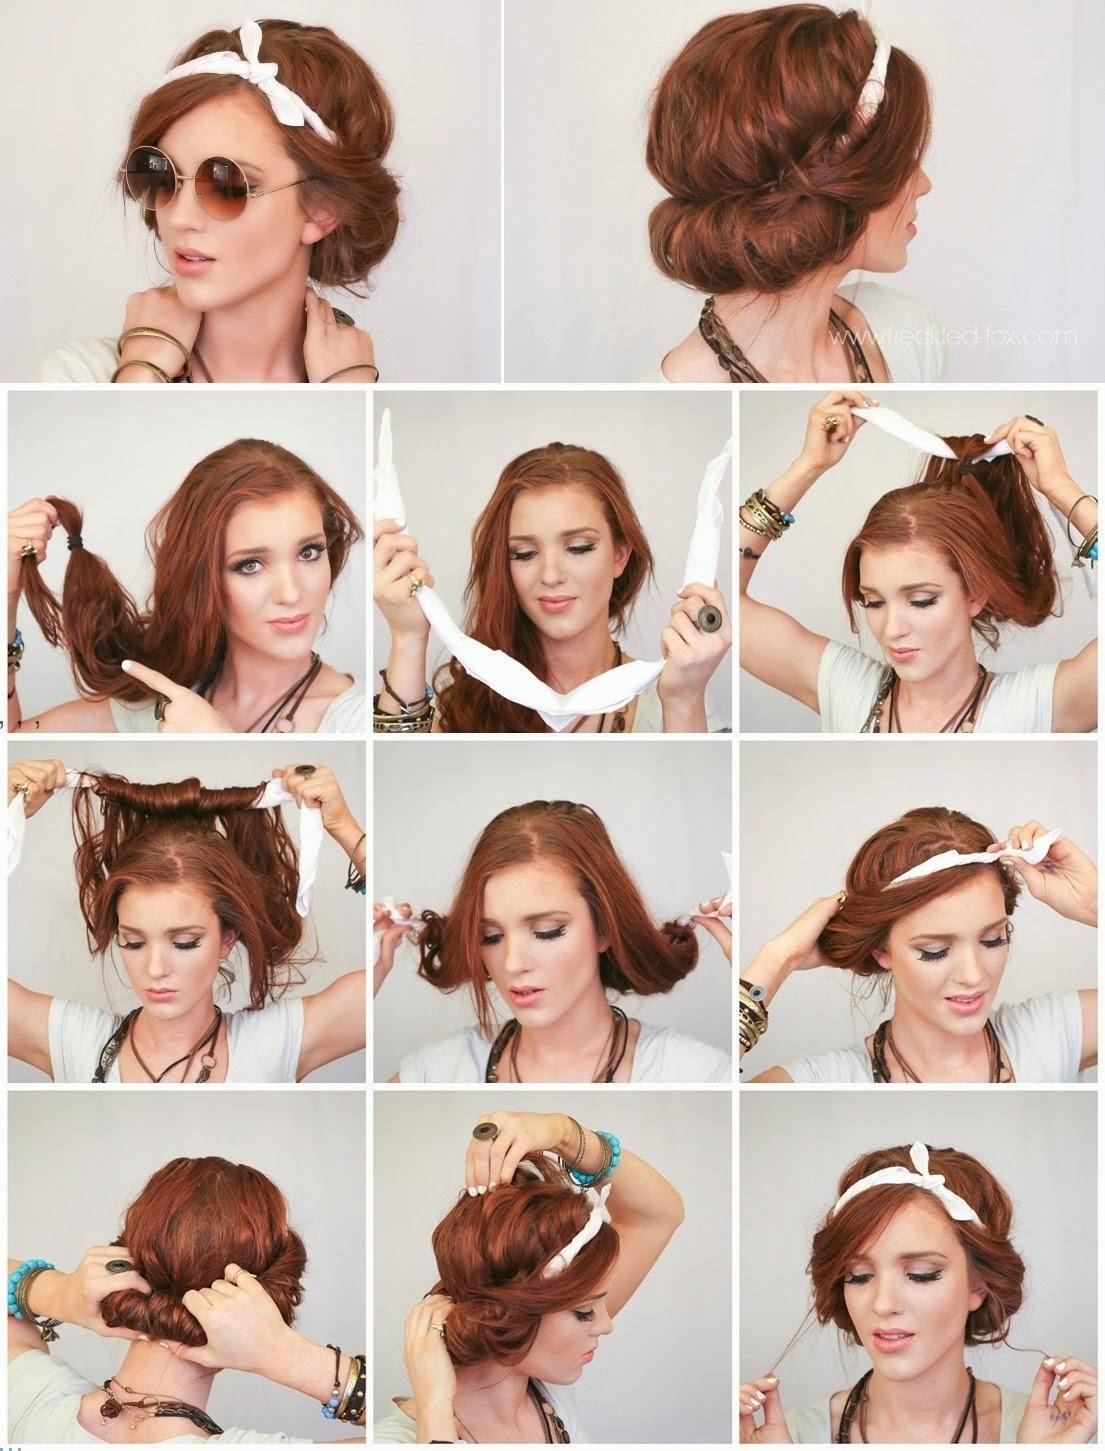 Pricheski Za 5 Minut Poshagovo Hipster Hairstyles Long Hair Styles Scarf Hairstyles